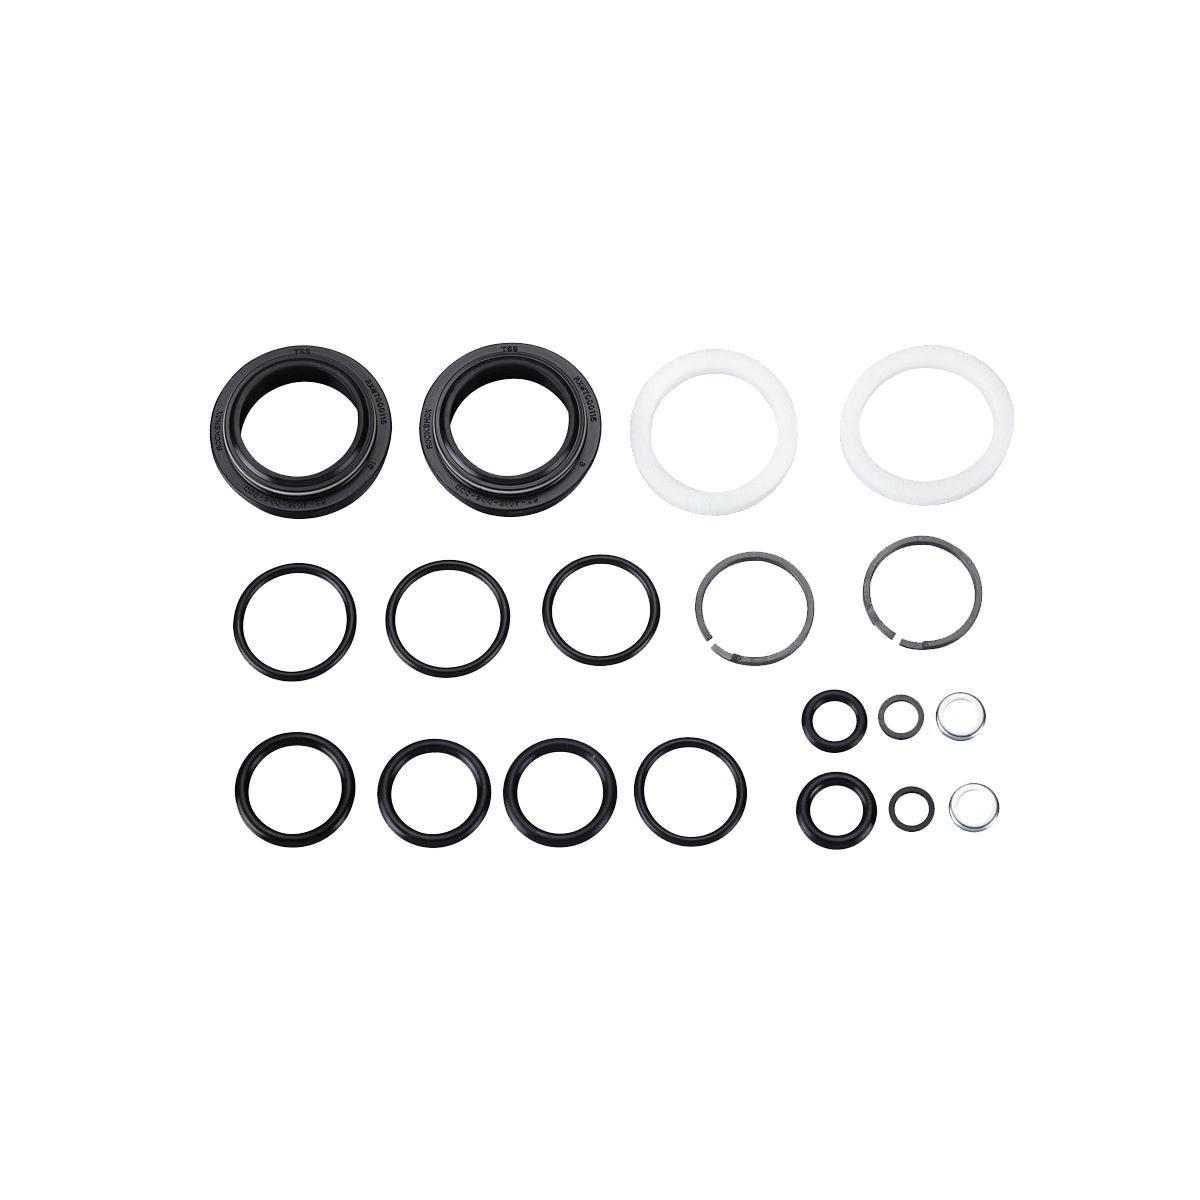 Rockshox Service - 200 Hour/1 Year Service Kit (Includes Dust Seals, Foam Rings, O-Ring Seals) - Reba A7 120Mm (Standard) (2018+): Black